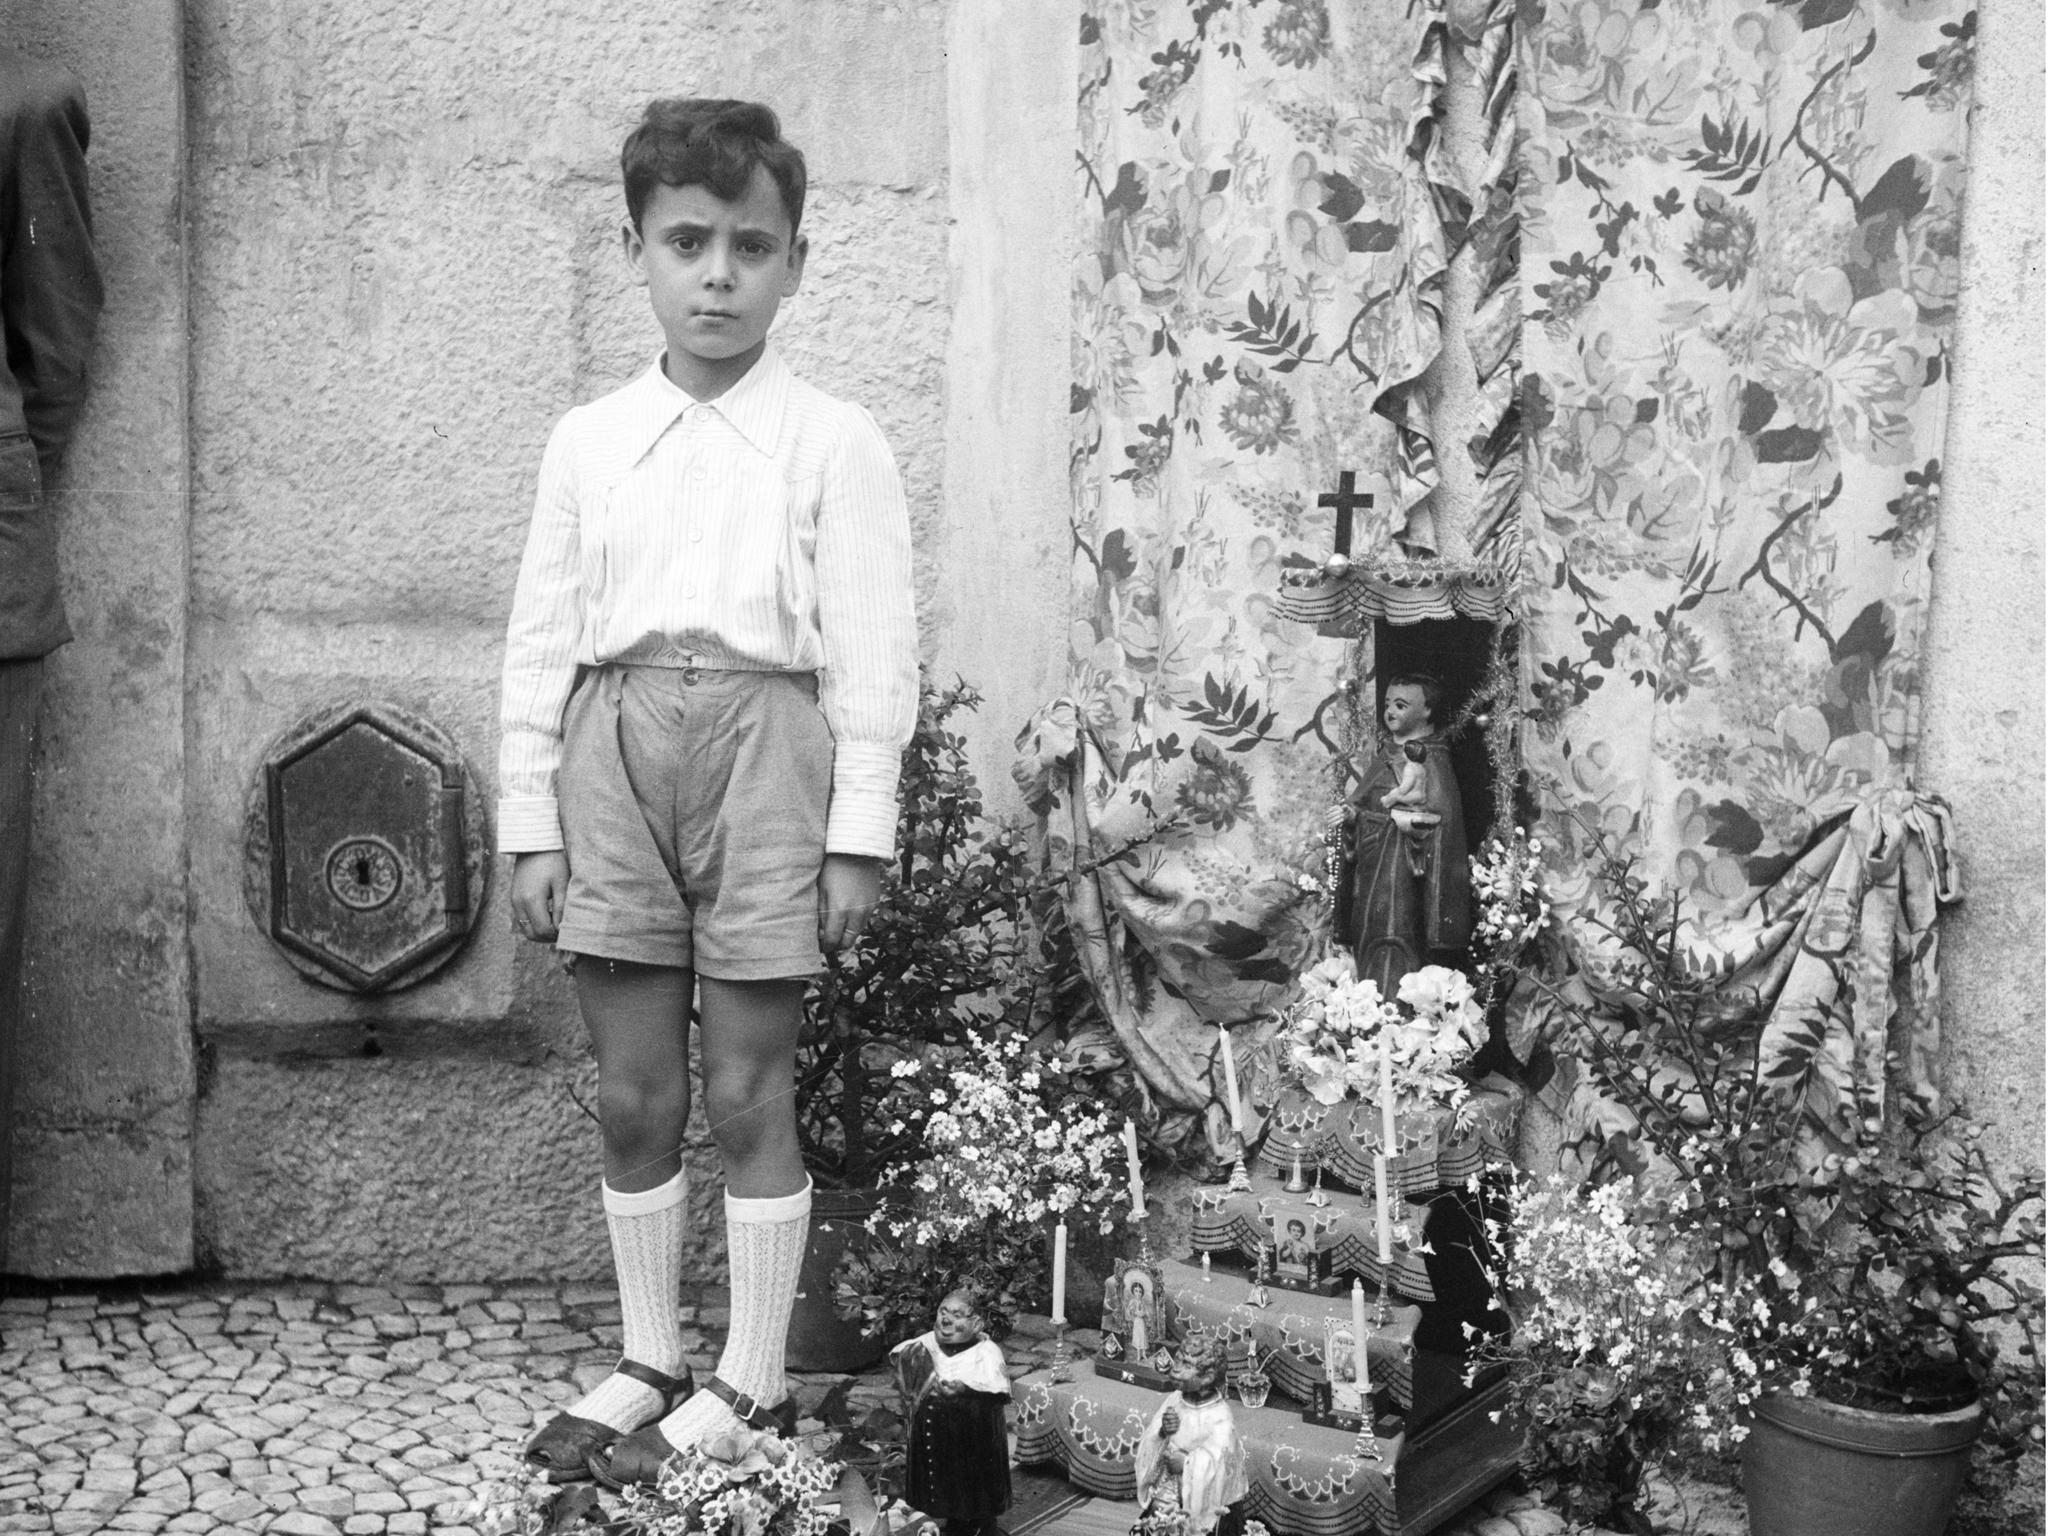 Festas populares, trono de Santo António, 1950